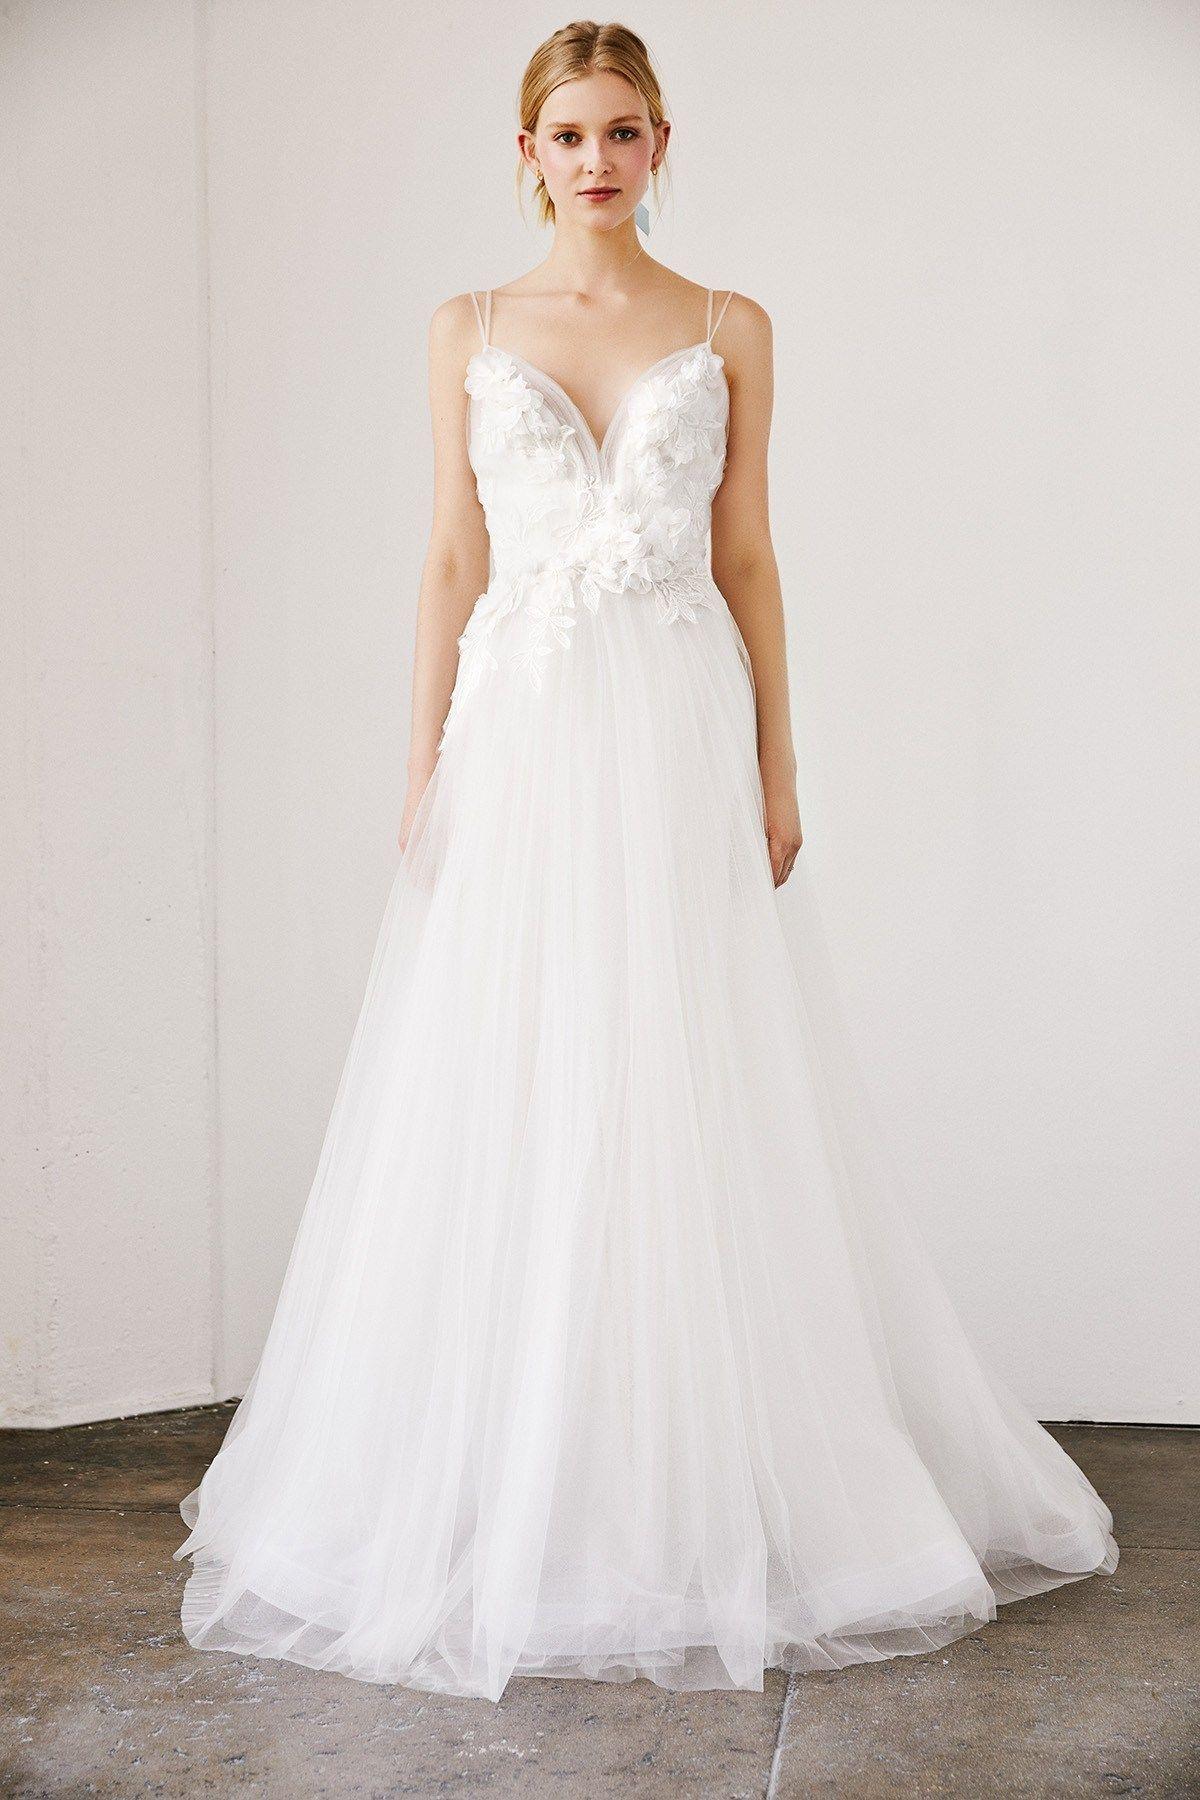 43+ Tadashi shoji short wedding dress ideas